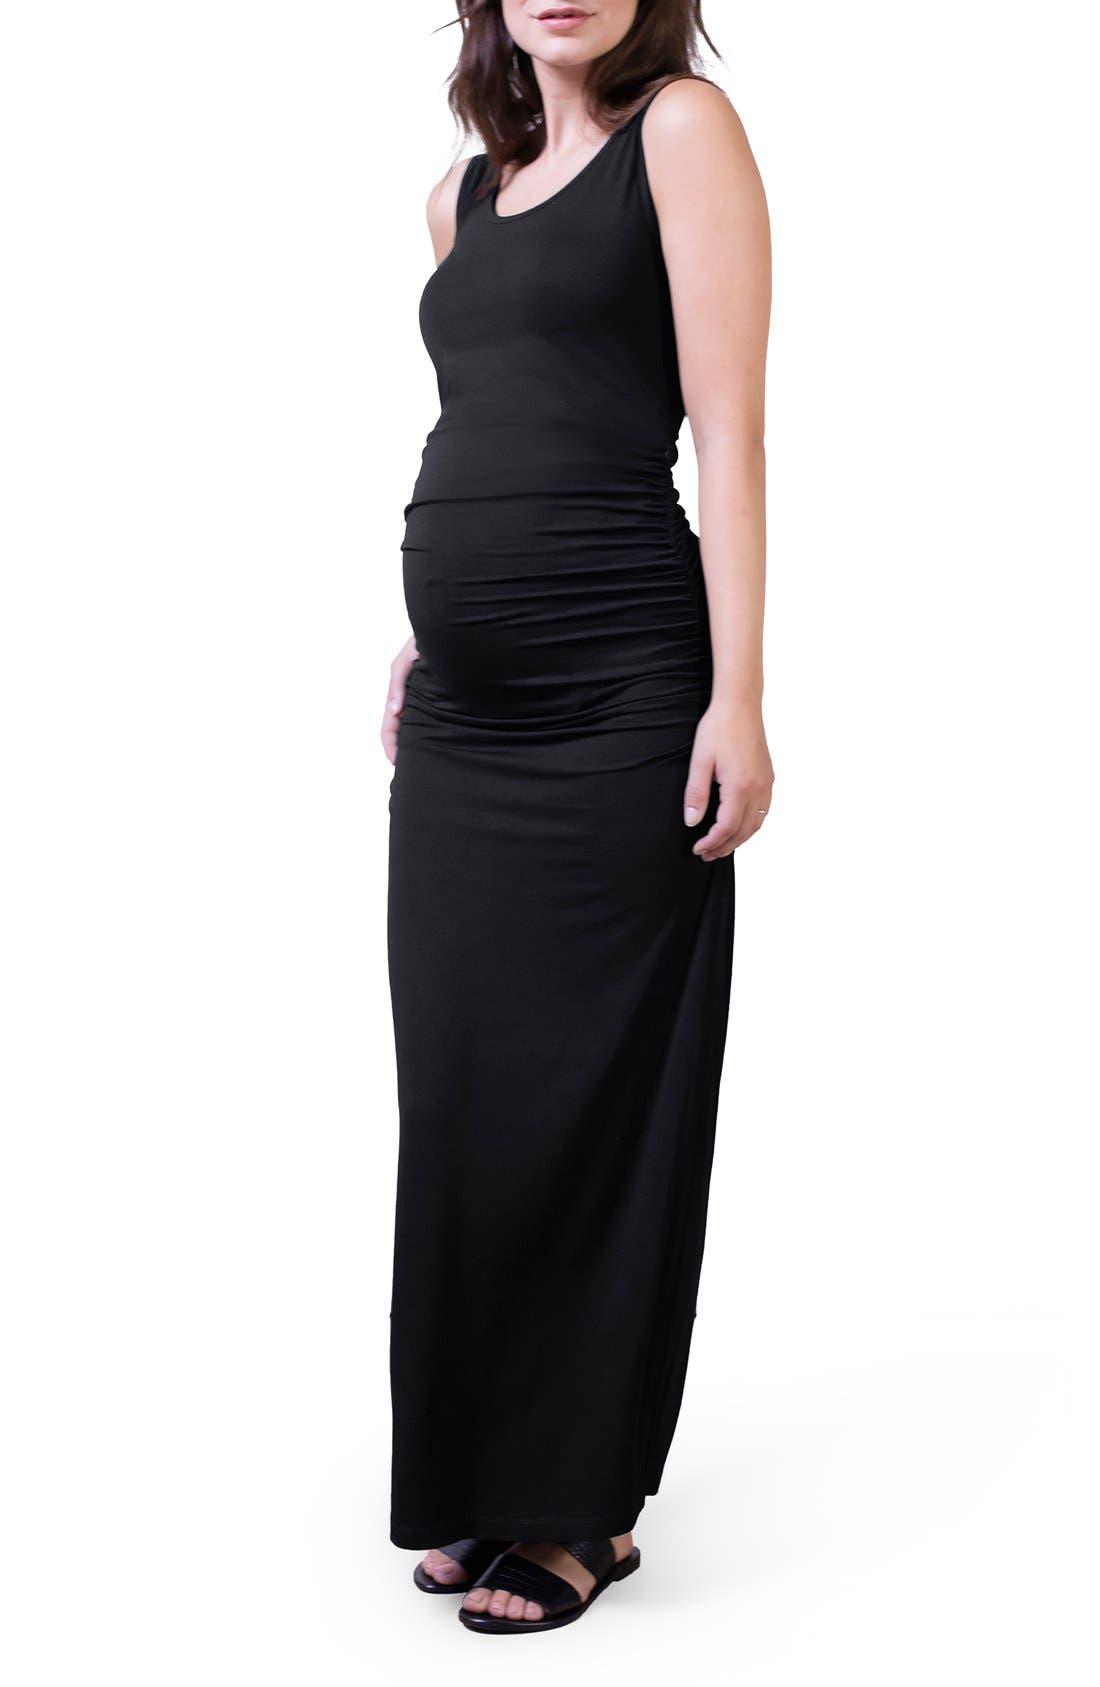 Main Image - Isabella Oliver 'Lisle' Maternity Maxi Tank Dress